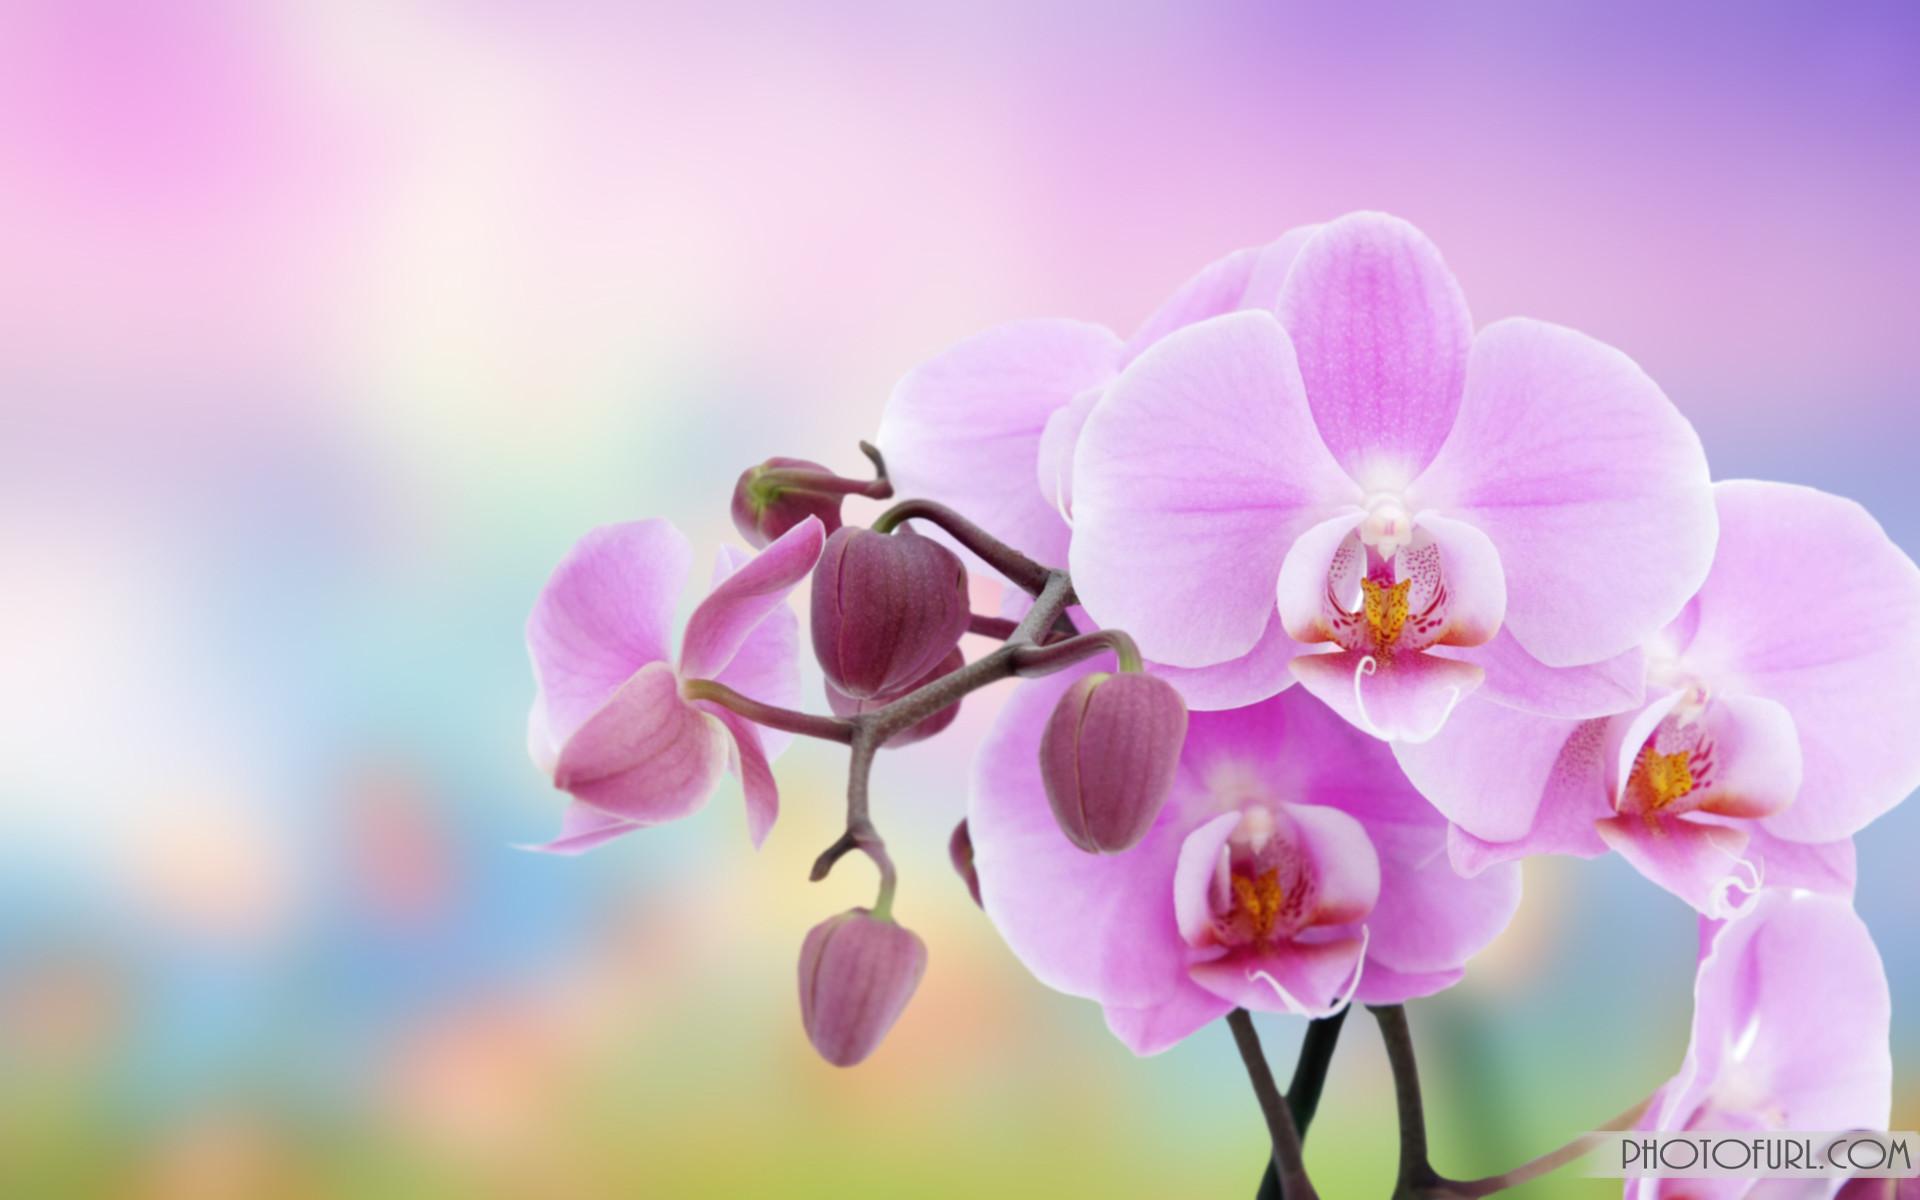 Flowers background | Flower wallpaper | images of flower | #27